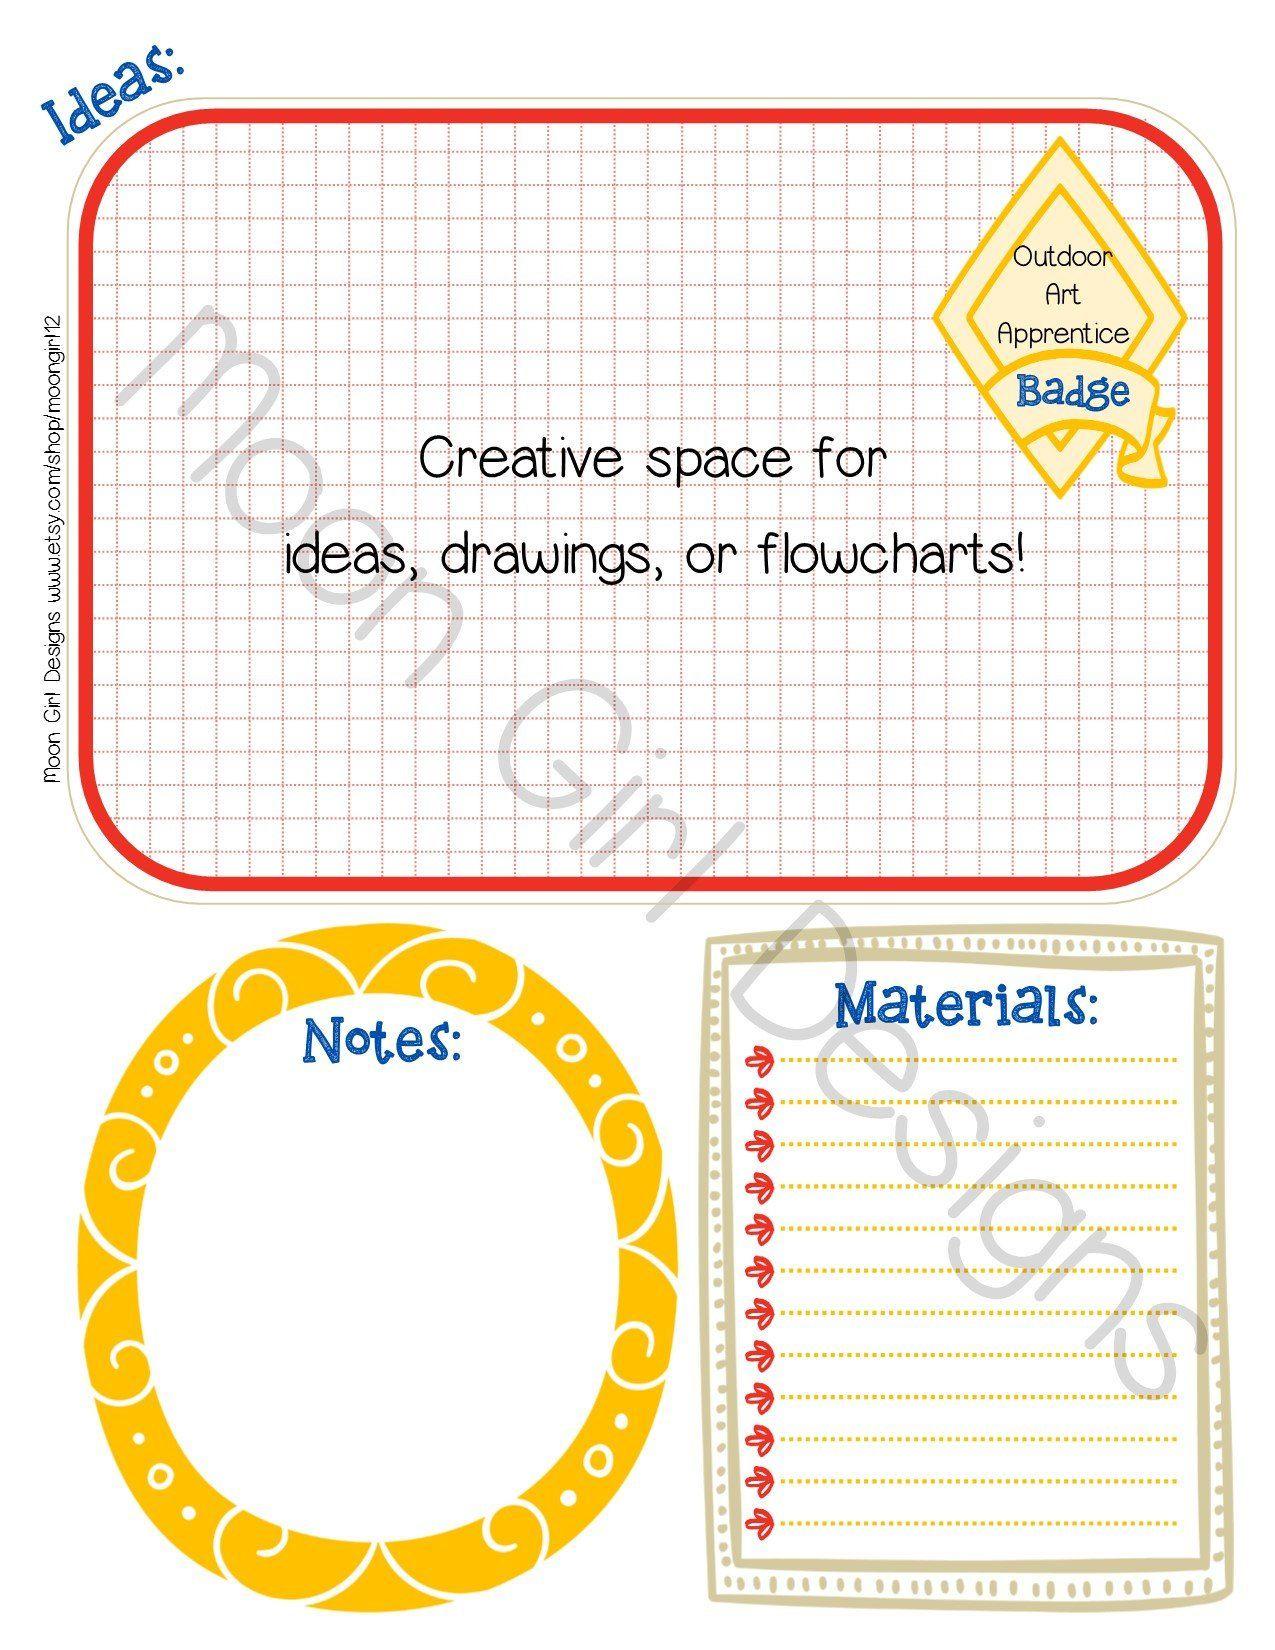 Cadette Badge Planner Girl Scout Leader Editable Printable